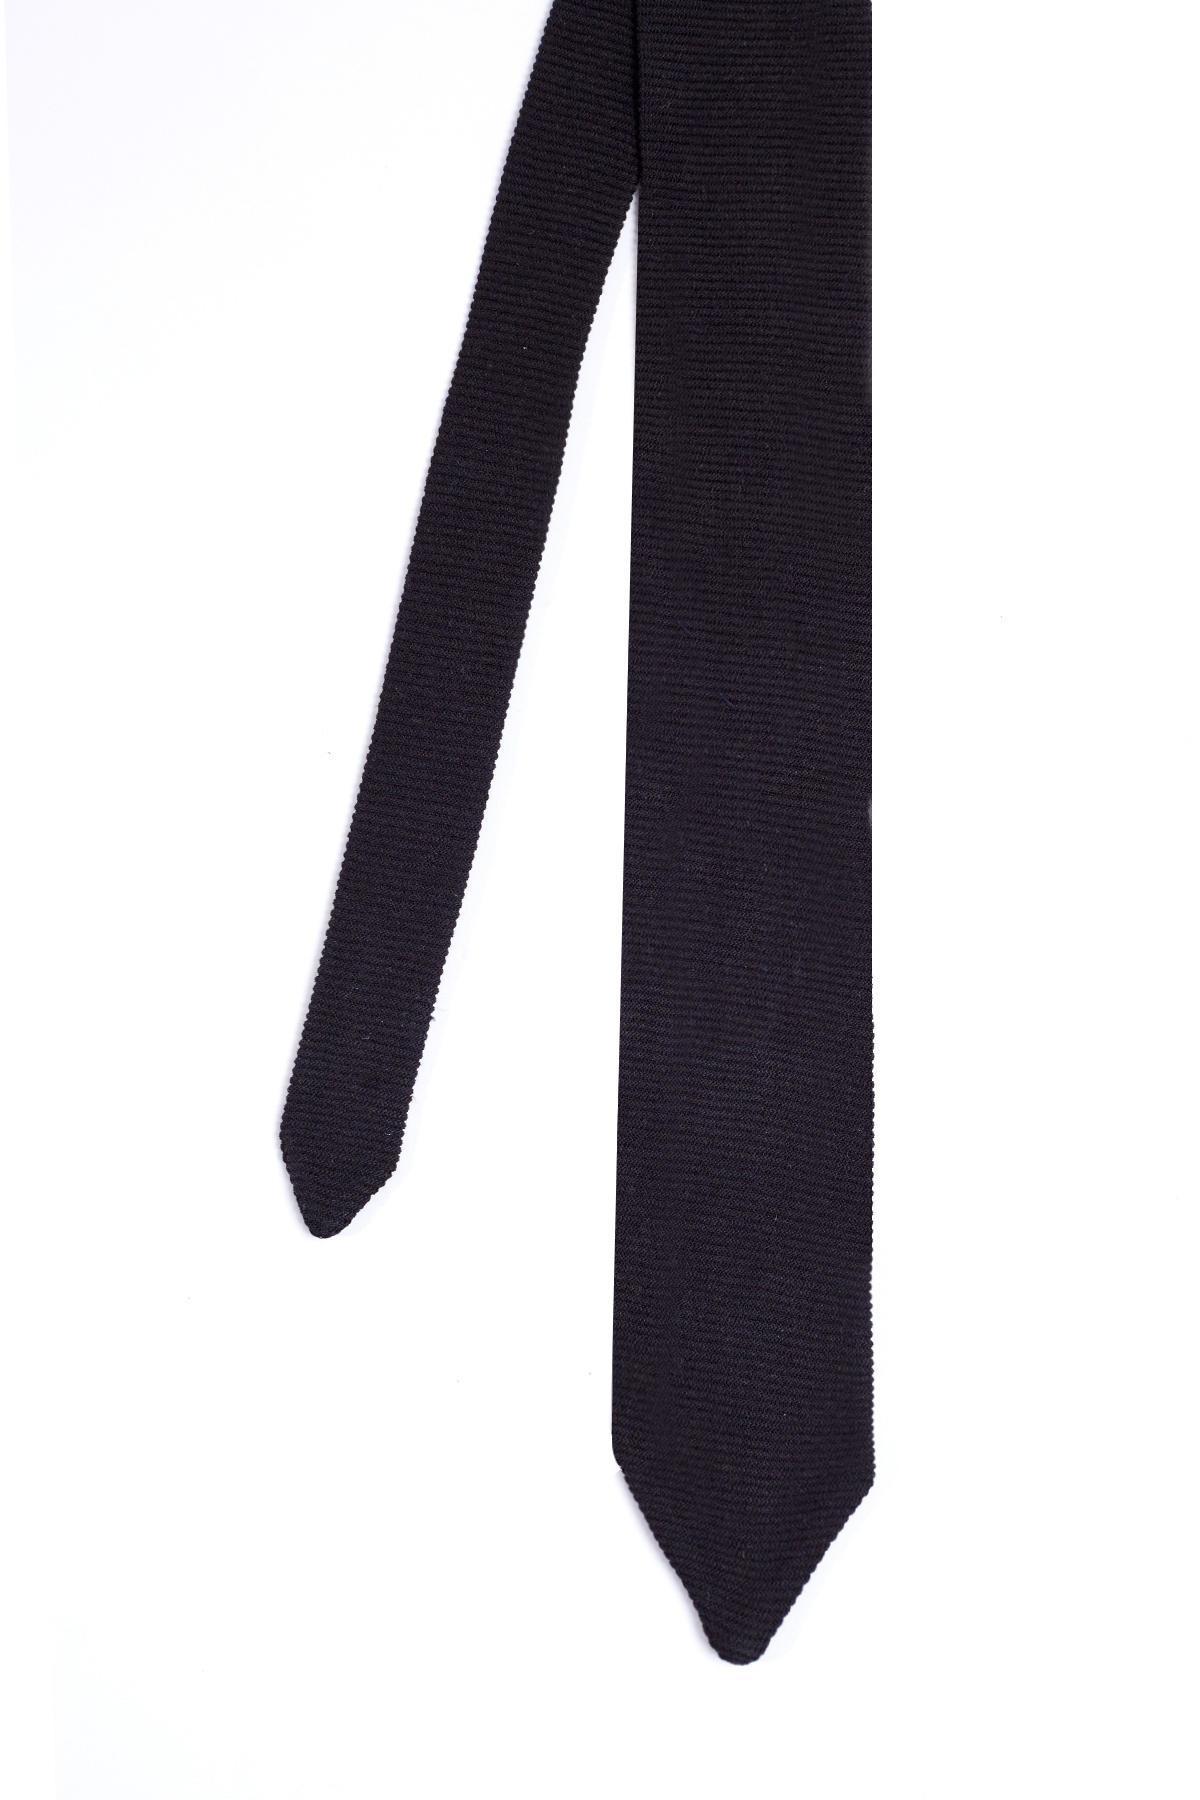 İpek Örgü Siyah Kravat